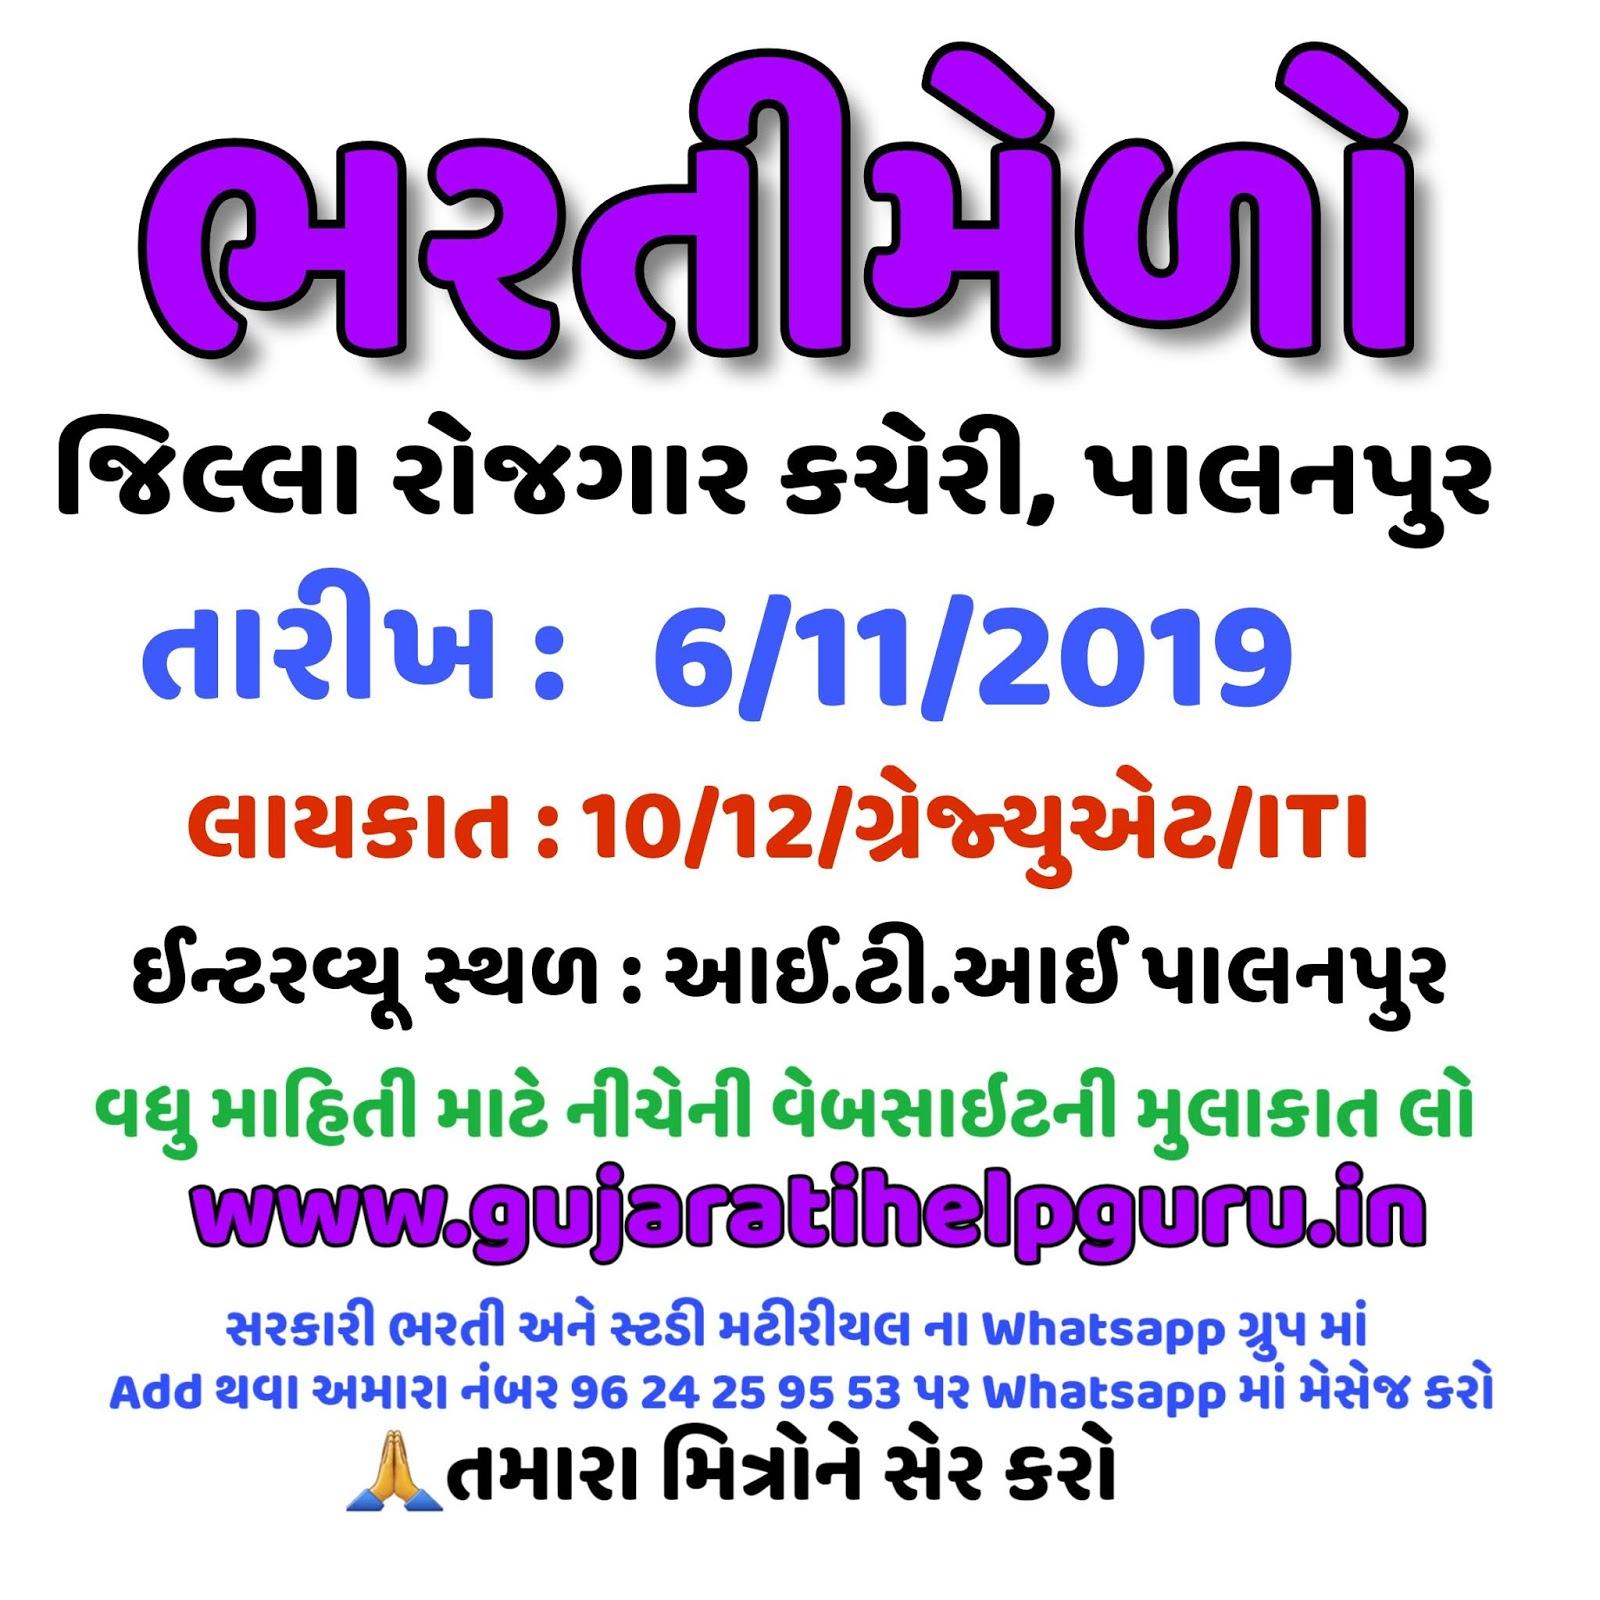 District Employment Exchange Palanpur Rozgaar Bharti Mela (06-11-2019) 1